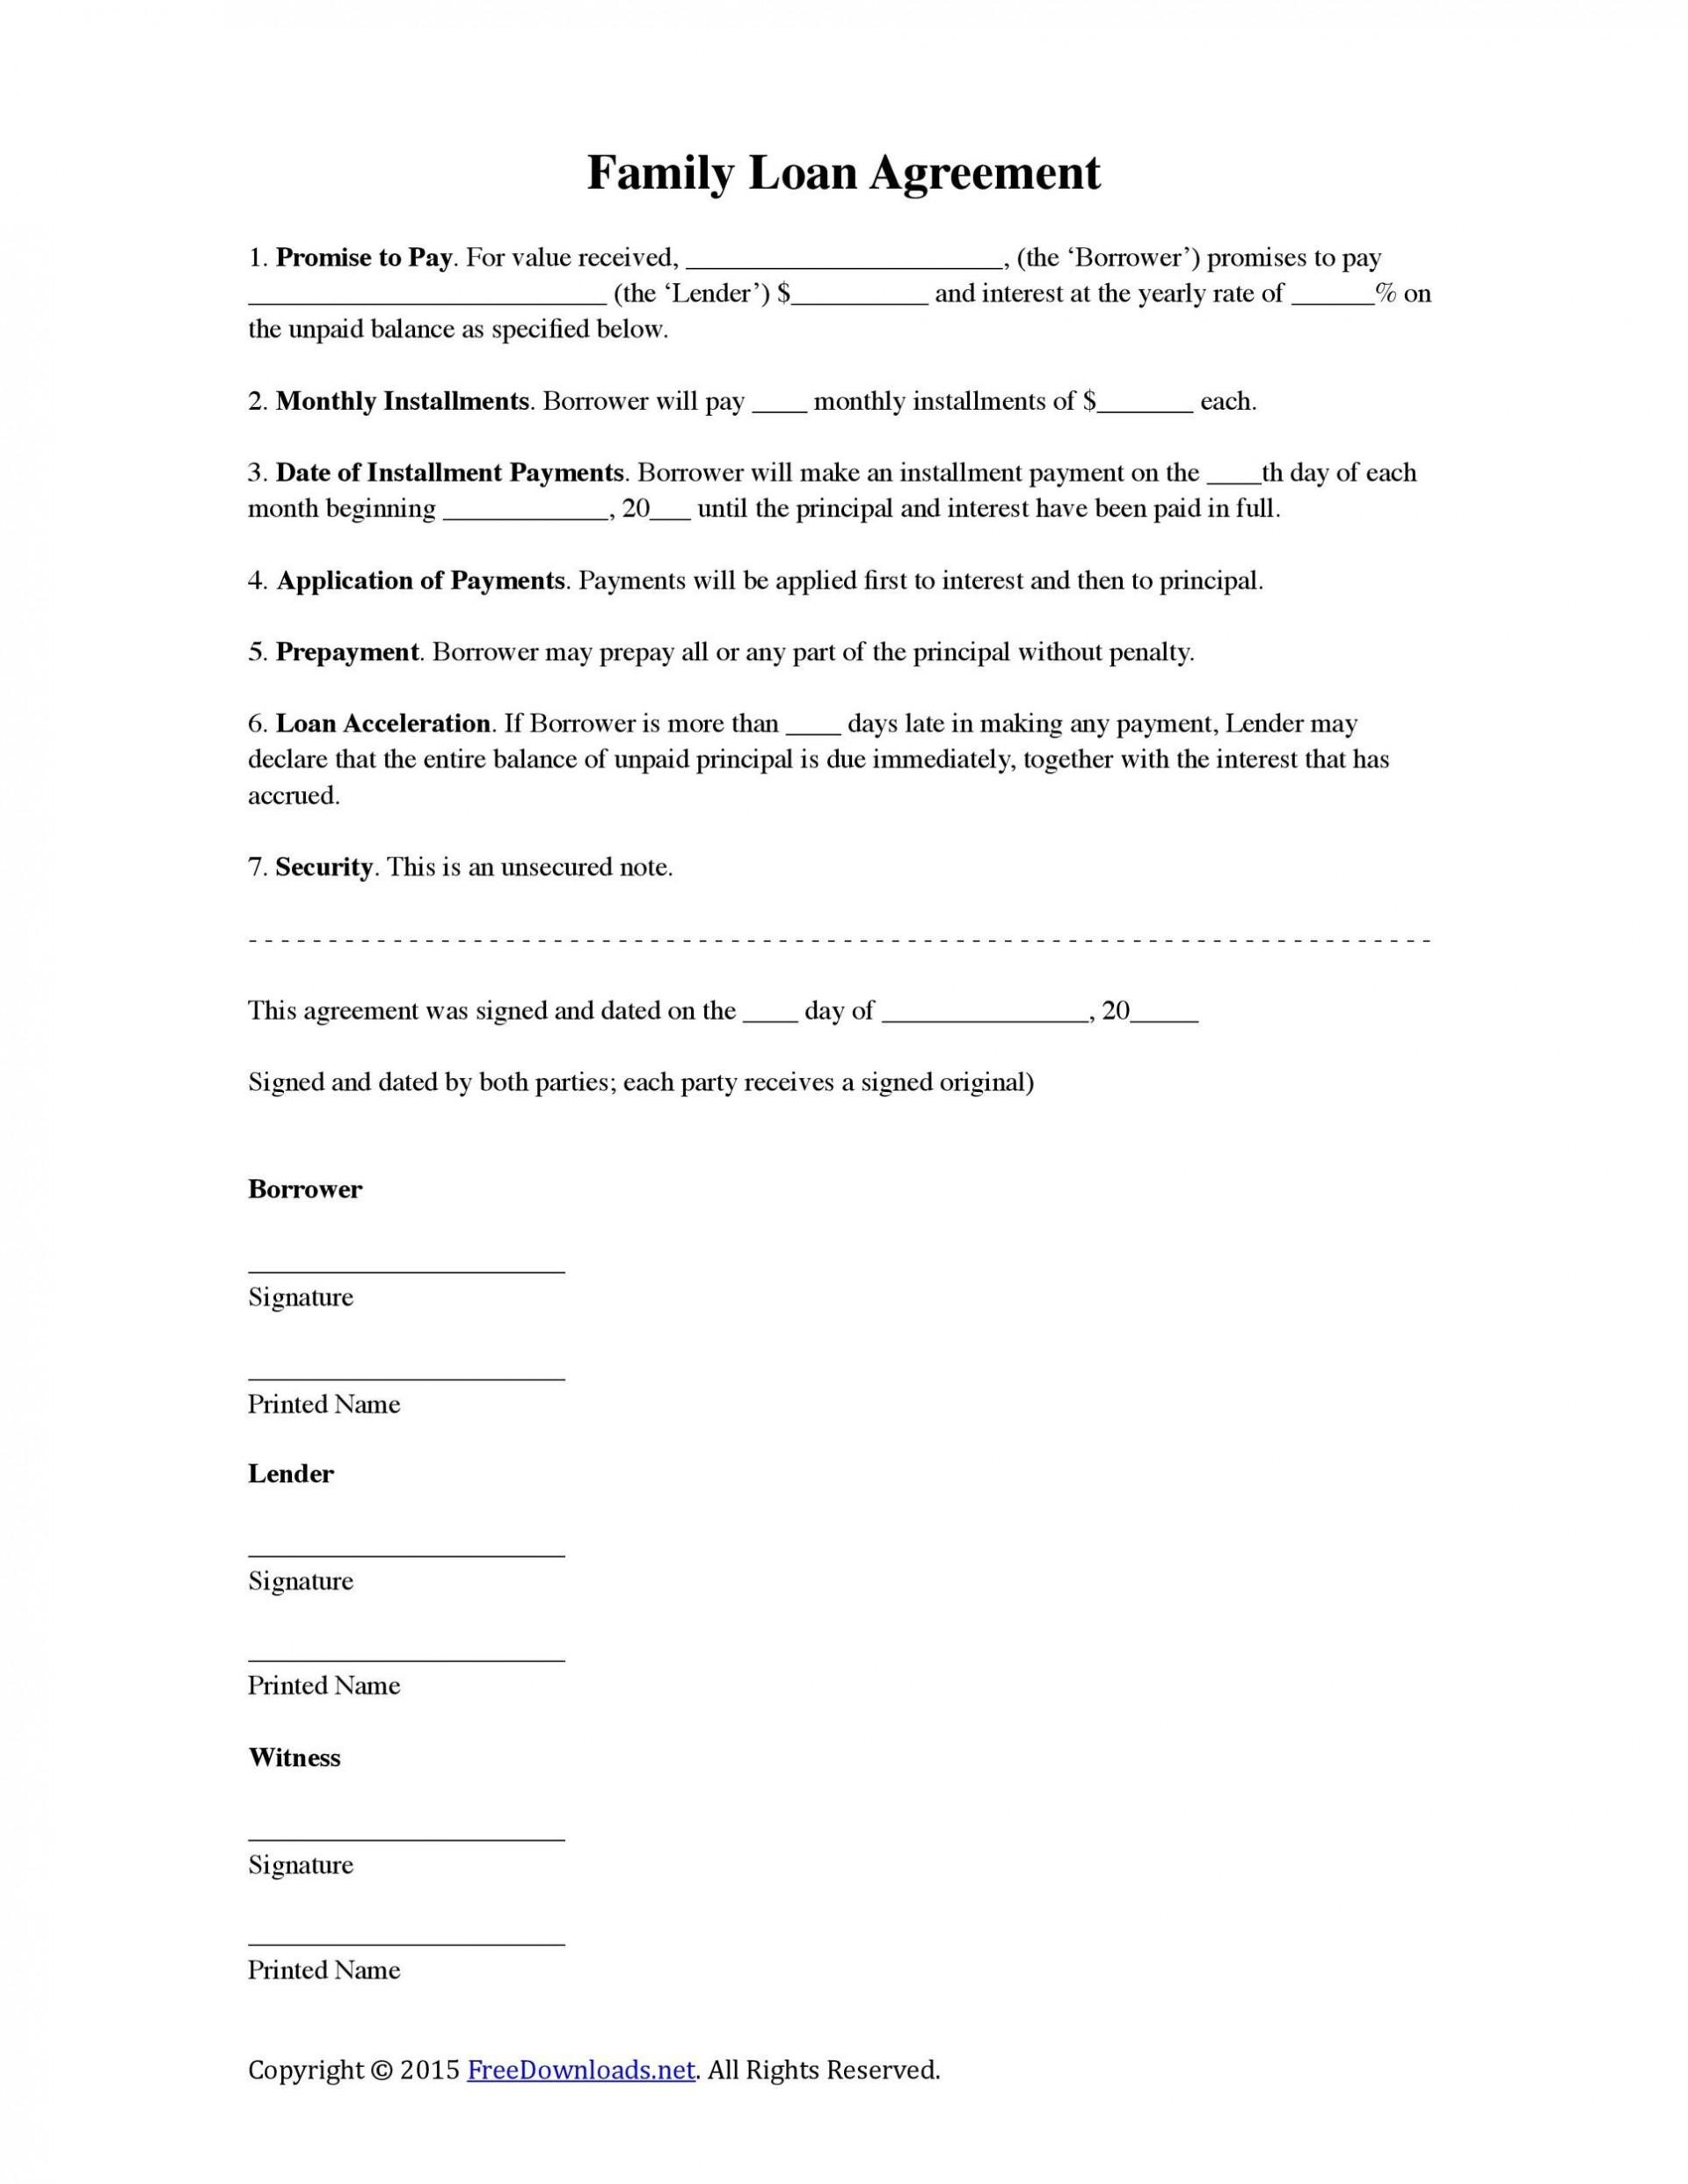 008 Impressive Family Loan Agreement Template Pdf Uk Image 1920